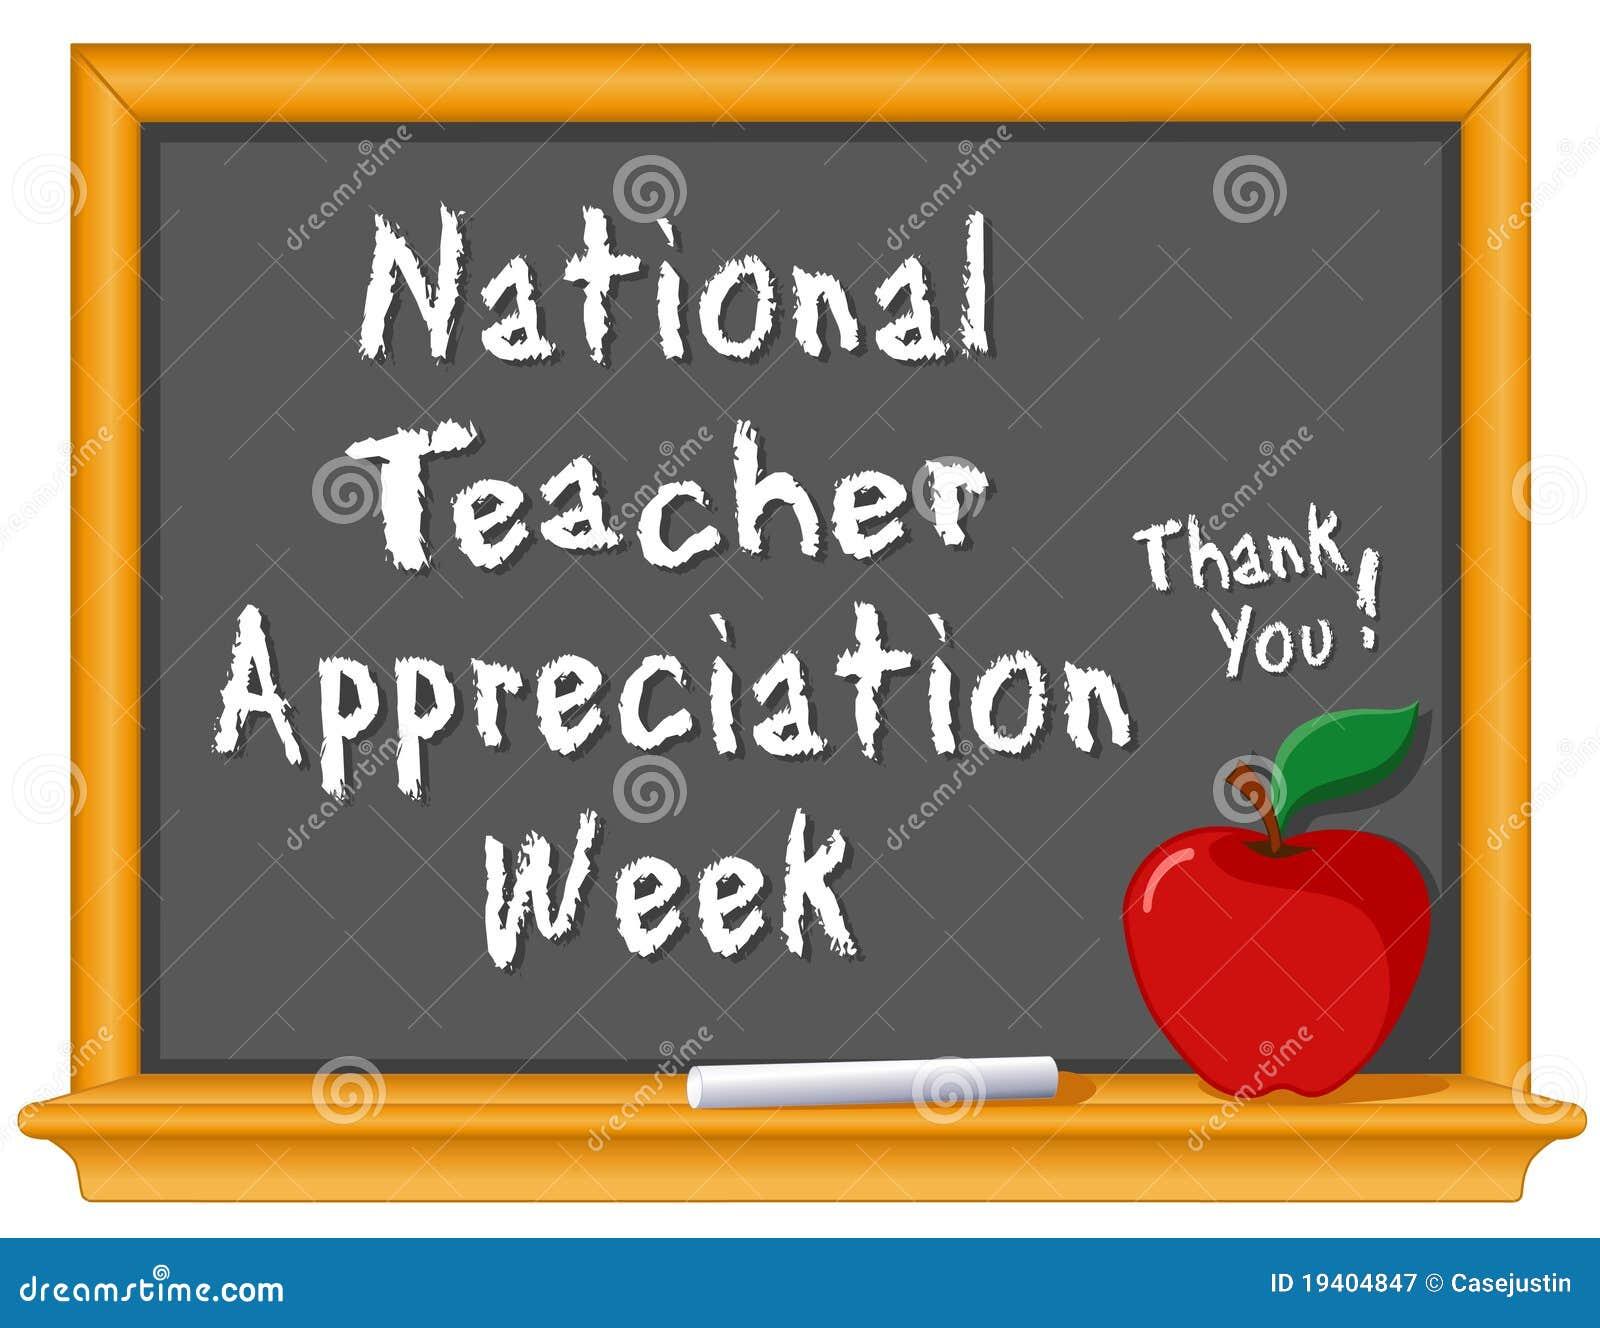 when is national teacher appreciation week   just b.CAUSE